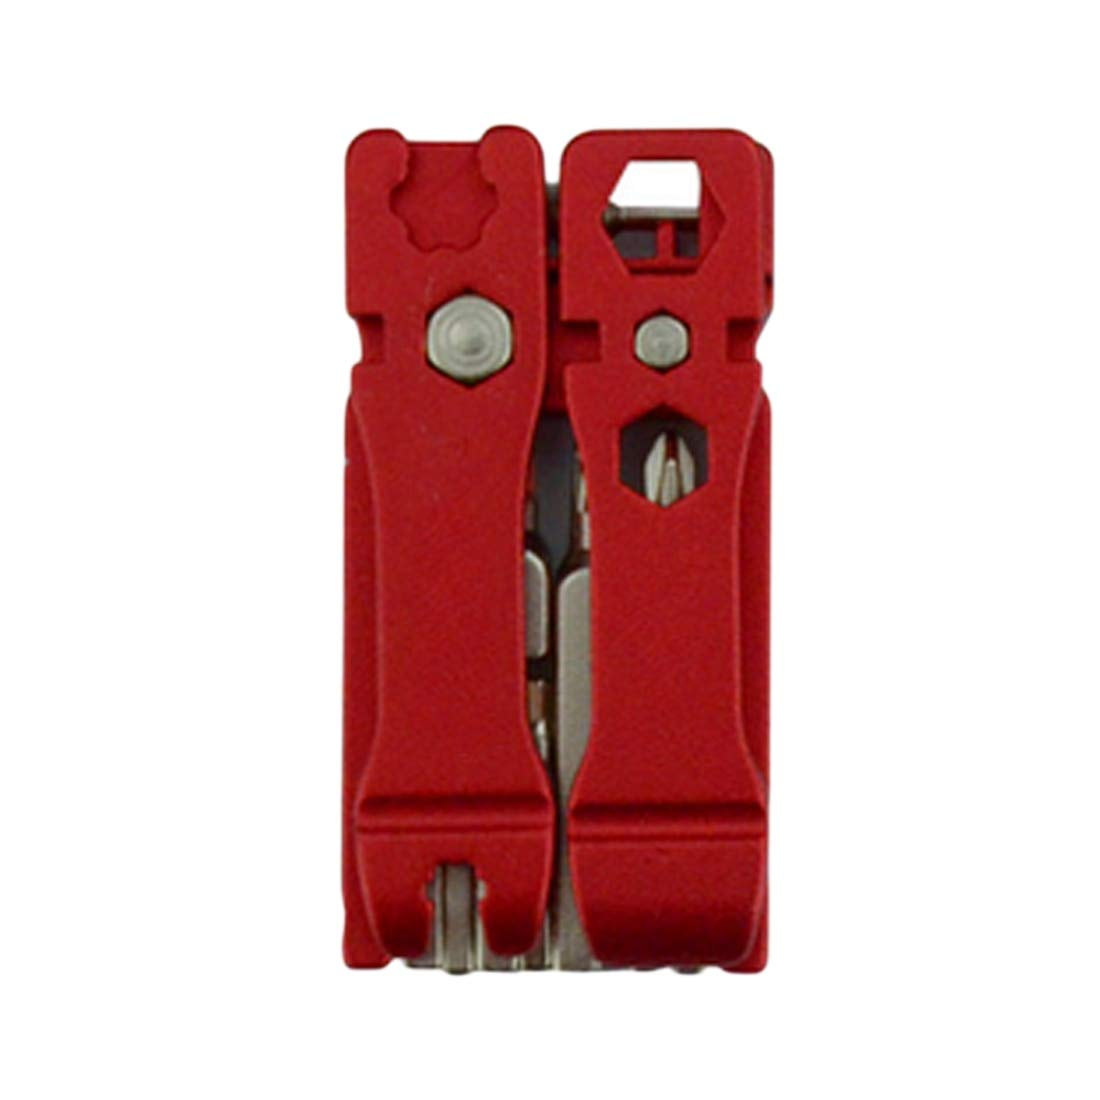 qianzhi 19 in 1 Portable Foldable Bicycle Multifunctional Tool Hex Key Screwdriver Wrench Bike Cycling Multi Repair Tools Set Kit